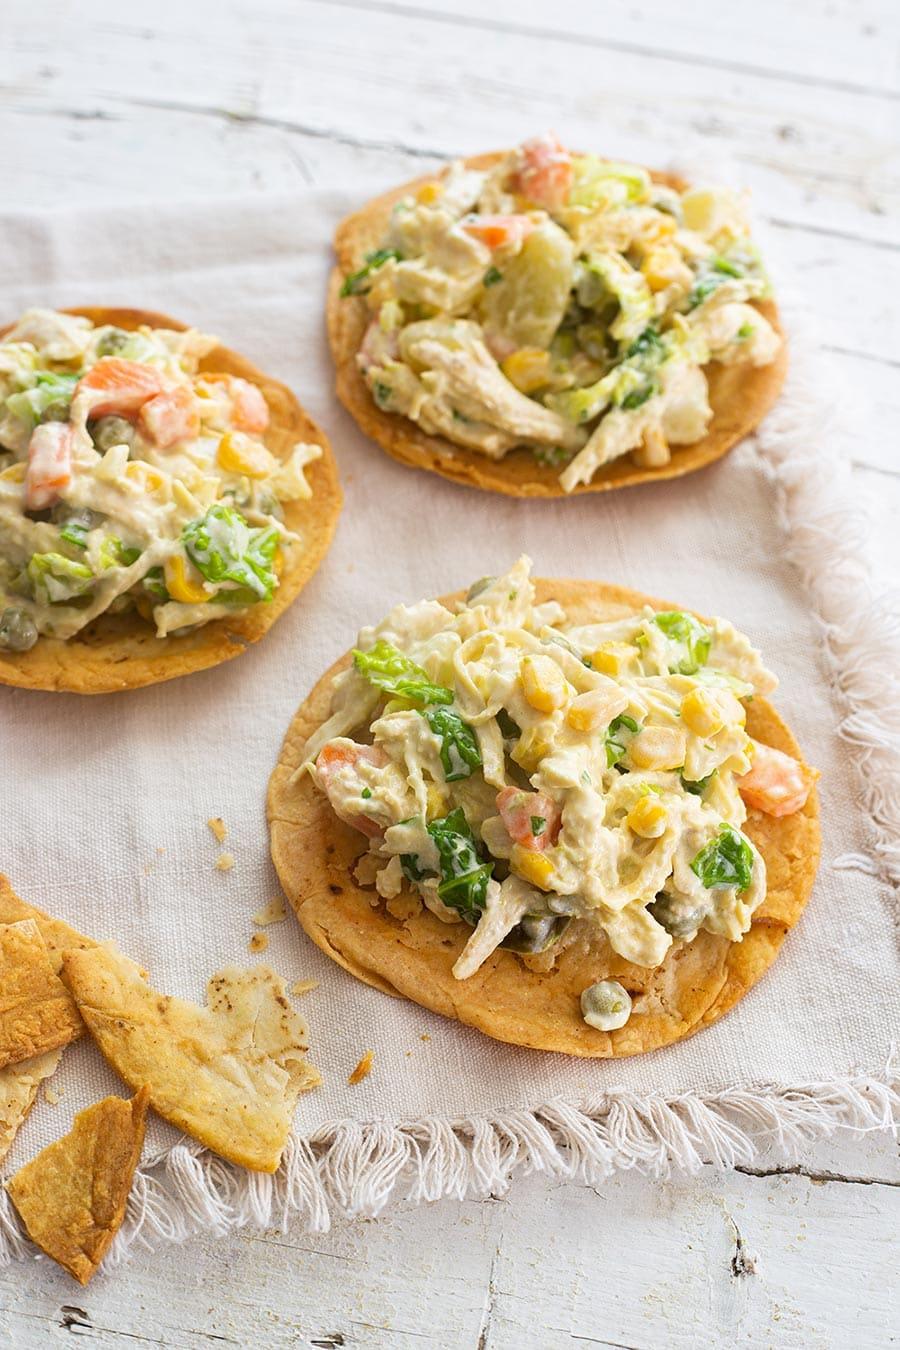 Tostadas with chicken potato salad.